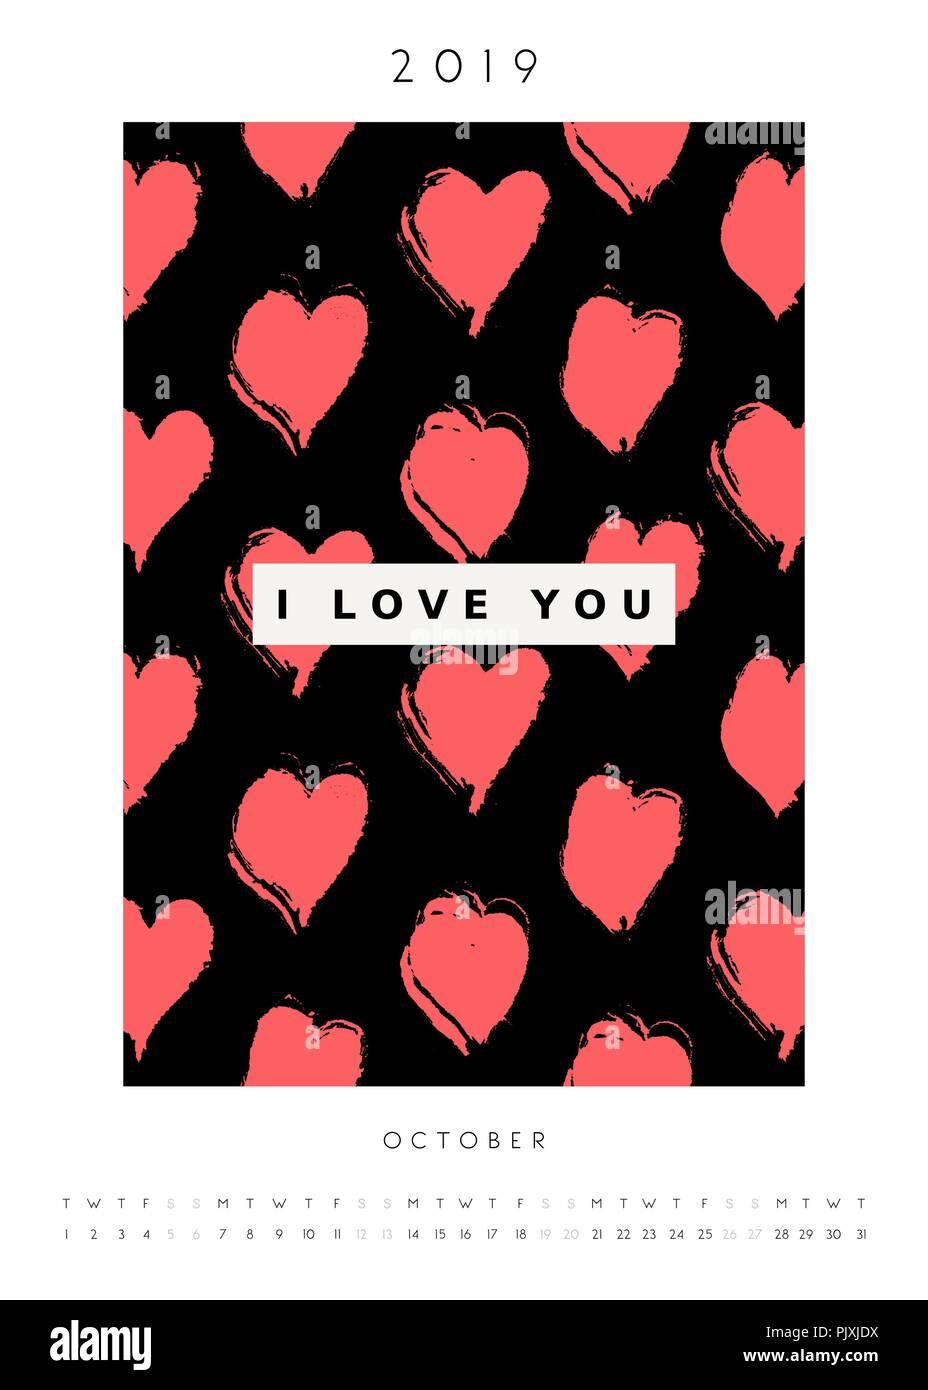 printable a4 size october 2019 calendar template hand drawn hearts